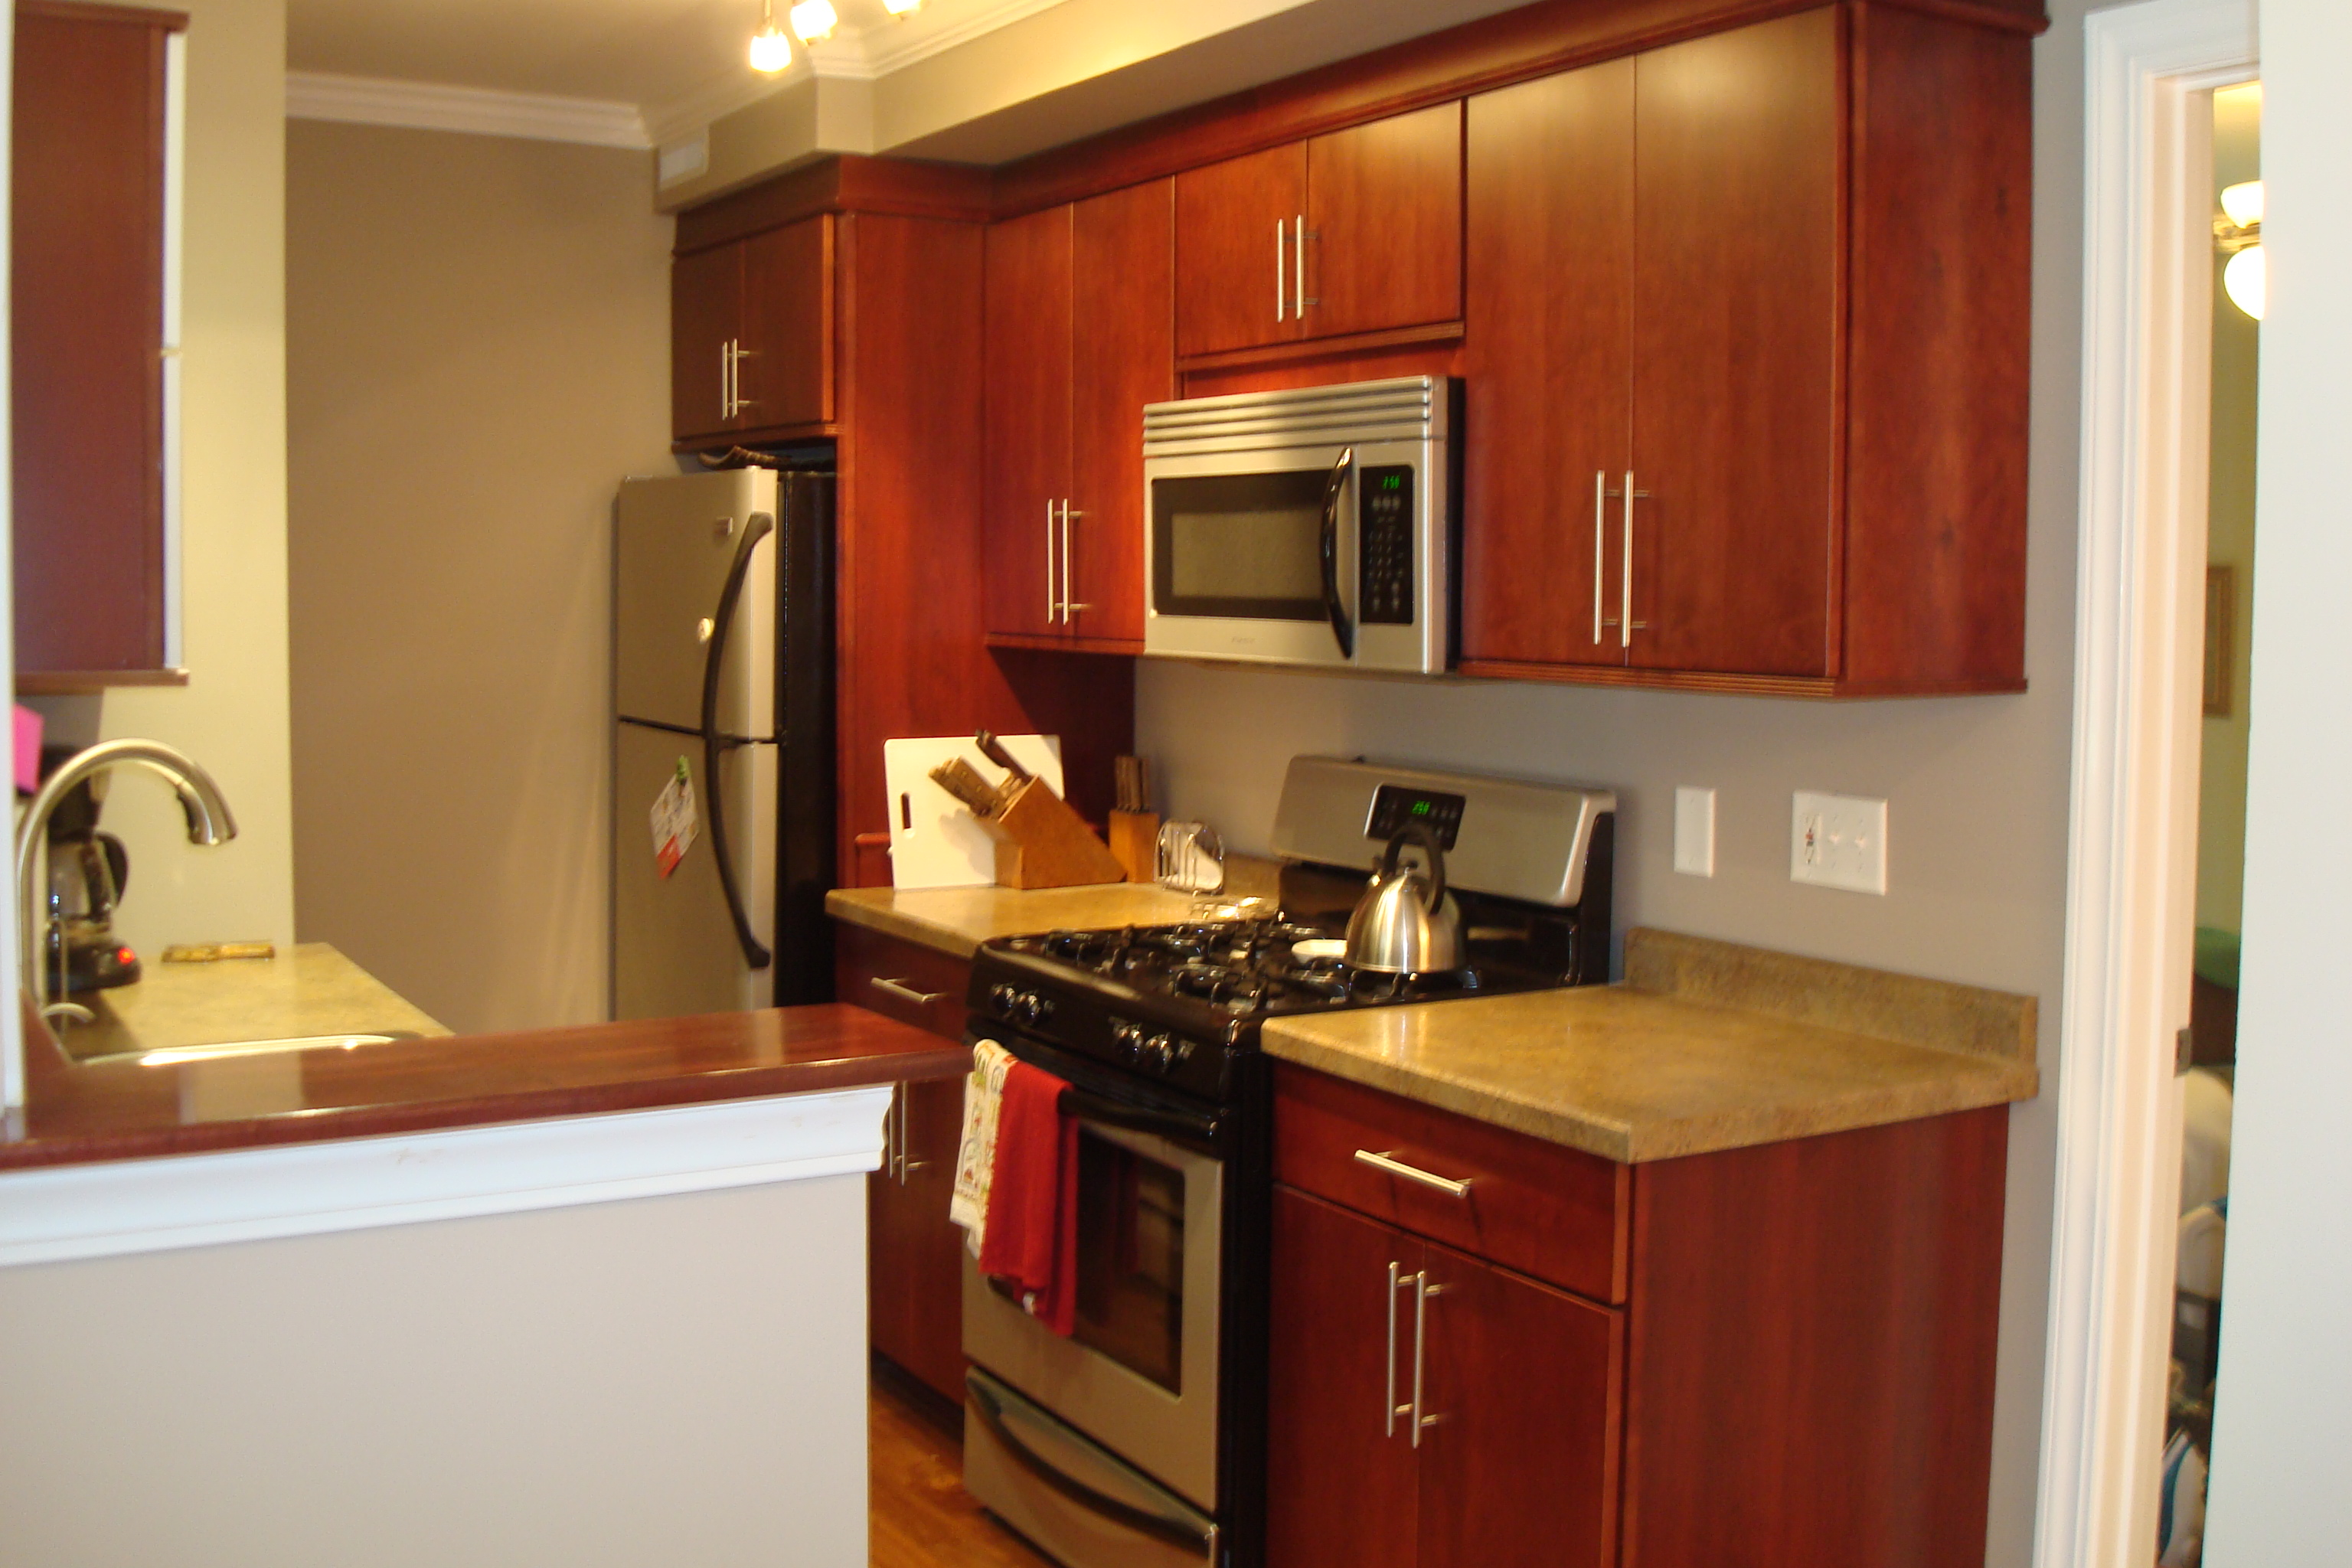 1 bedroom apartment rental heritage hill grand rapids mi - grand